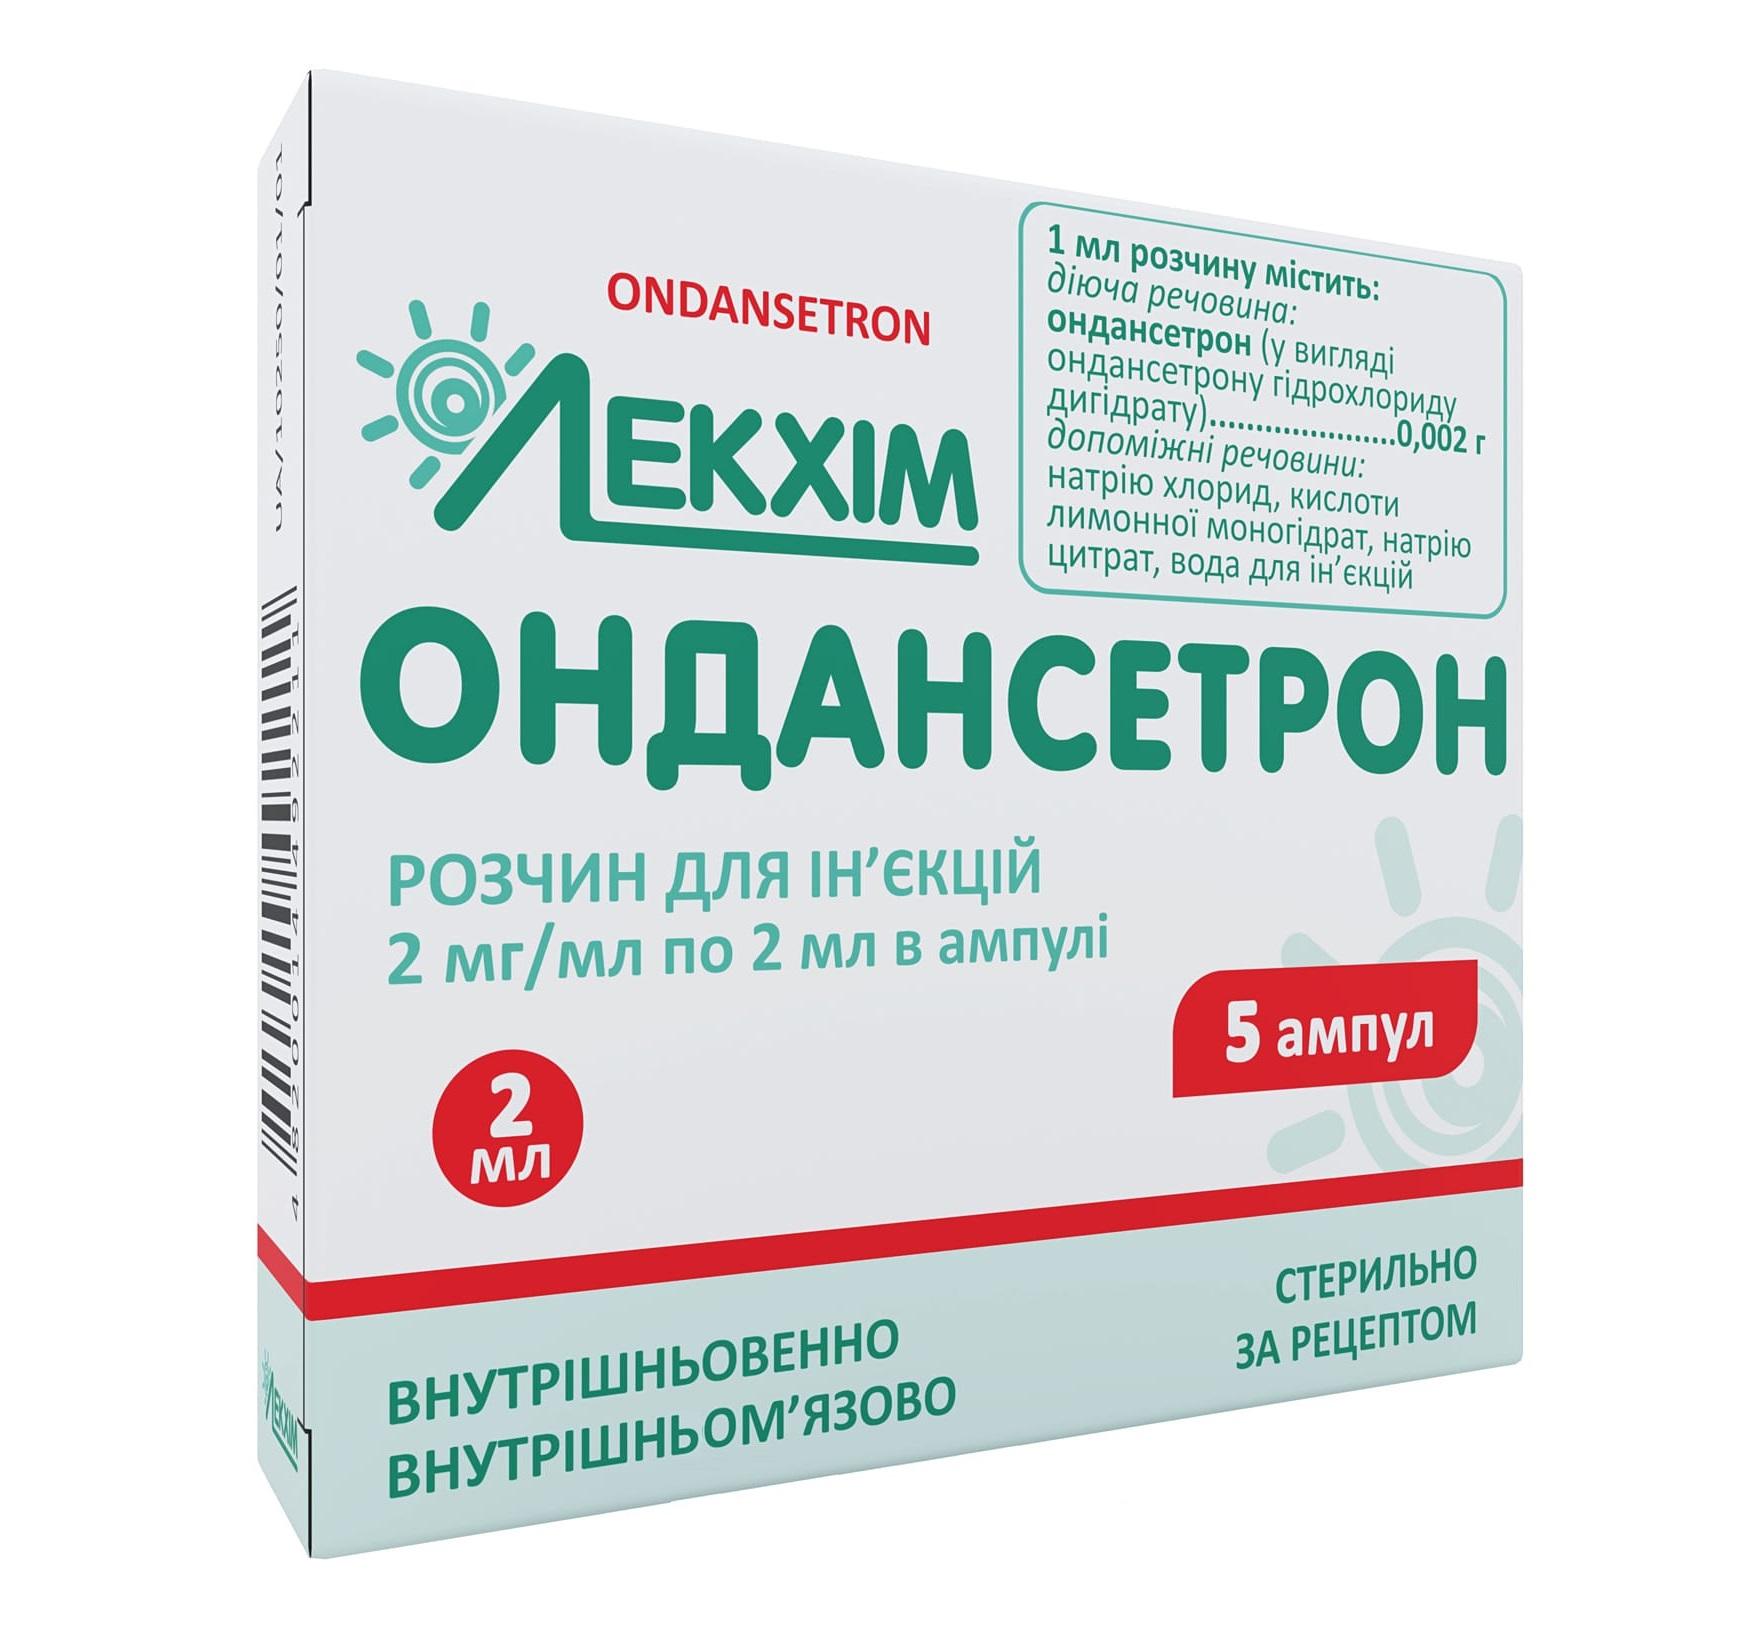 ОНДАНСЕТРОН АМП. 2МГ/МЛ 2МЛ №5 без ндс